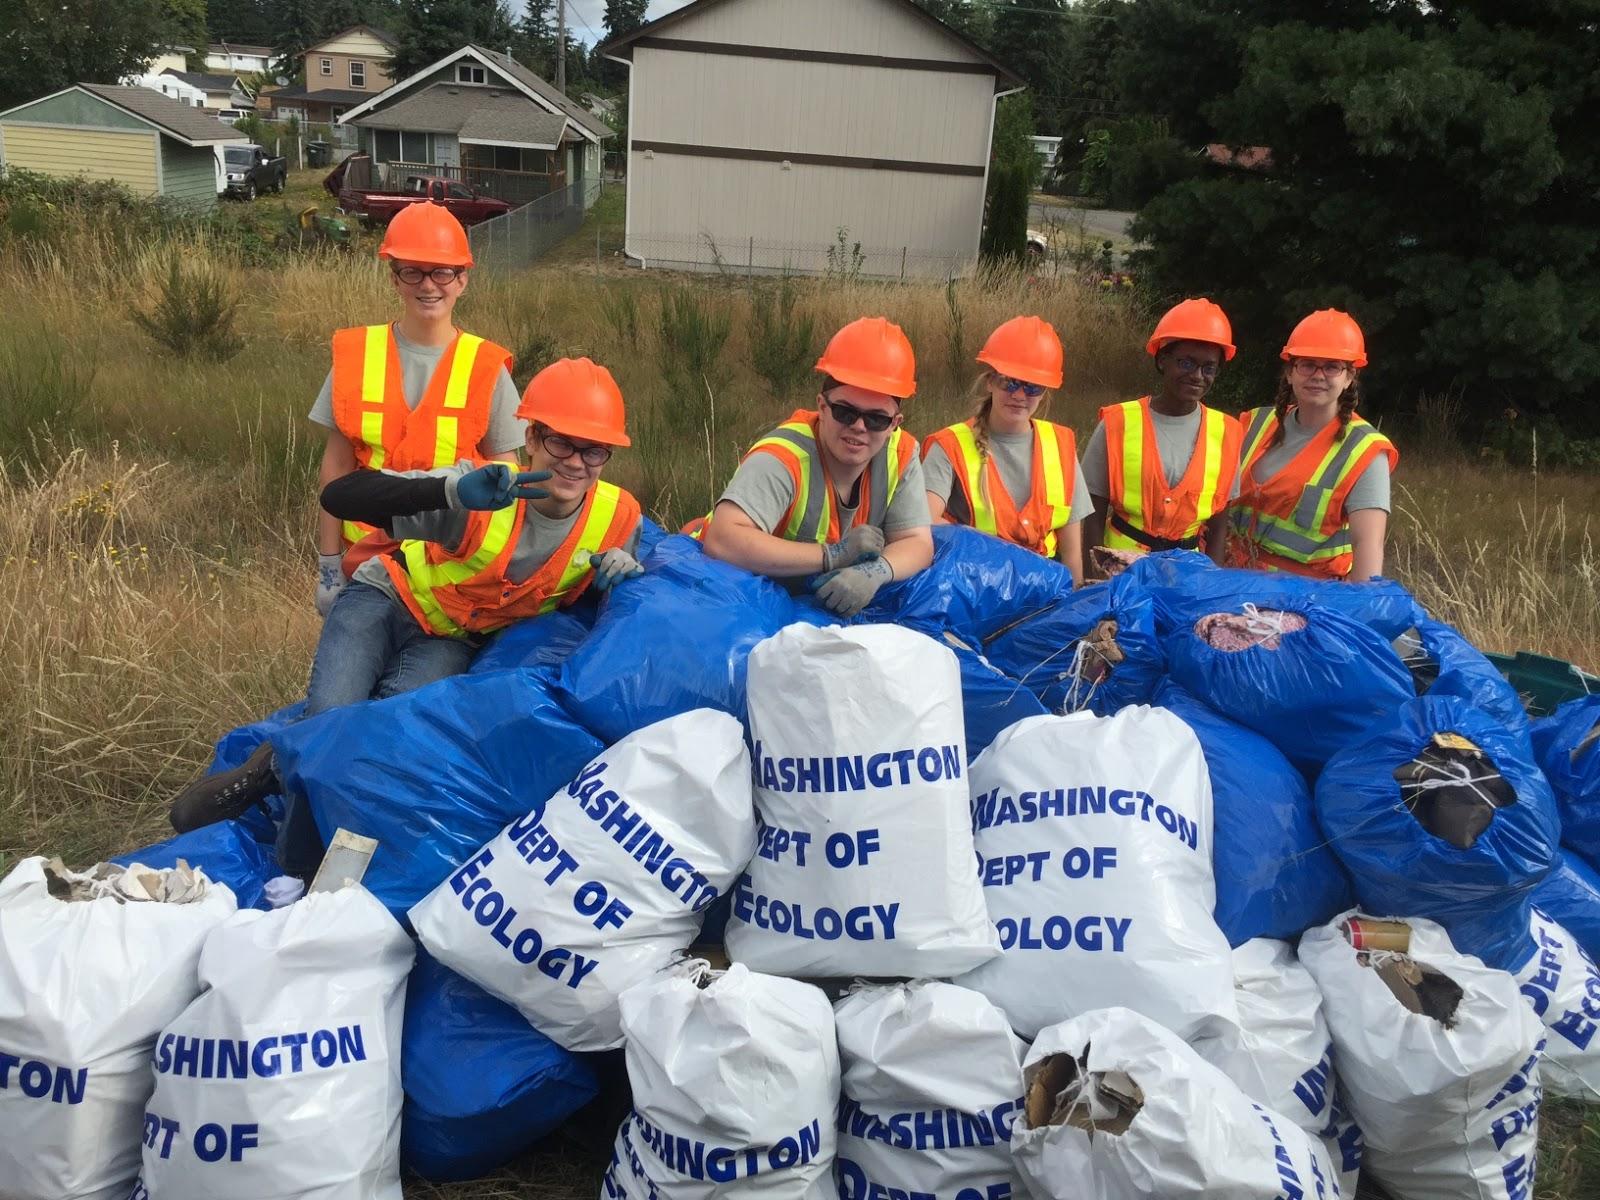 0217dd5453d Washington Department of Ecology: Washington litter czars welcome ...